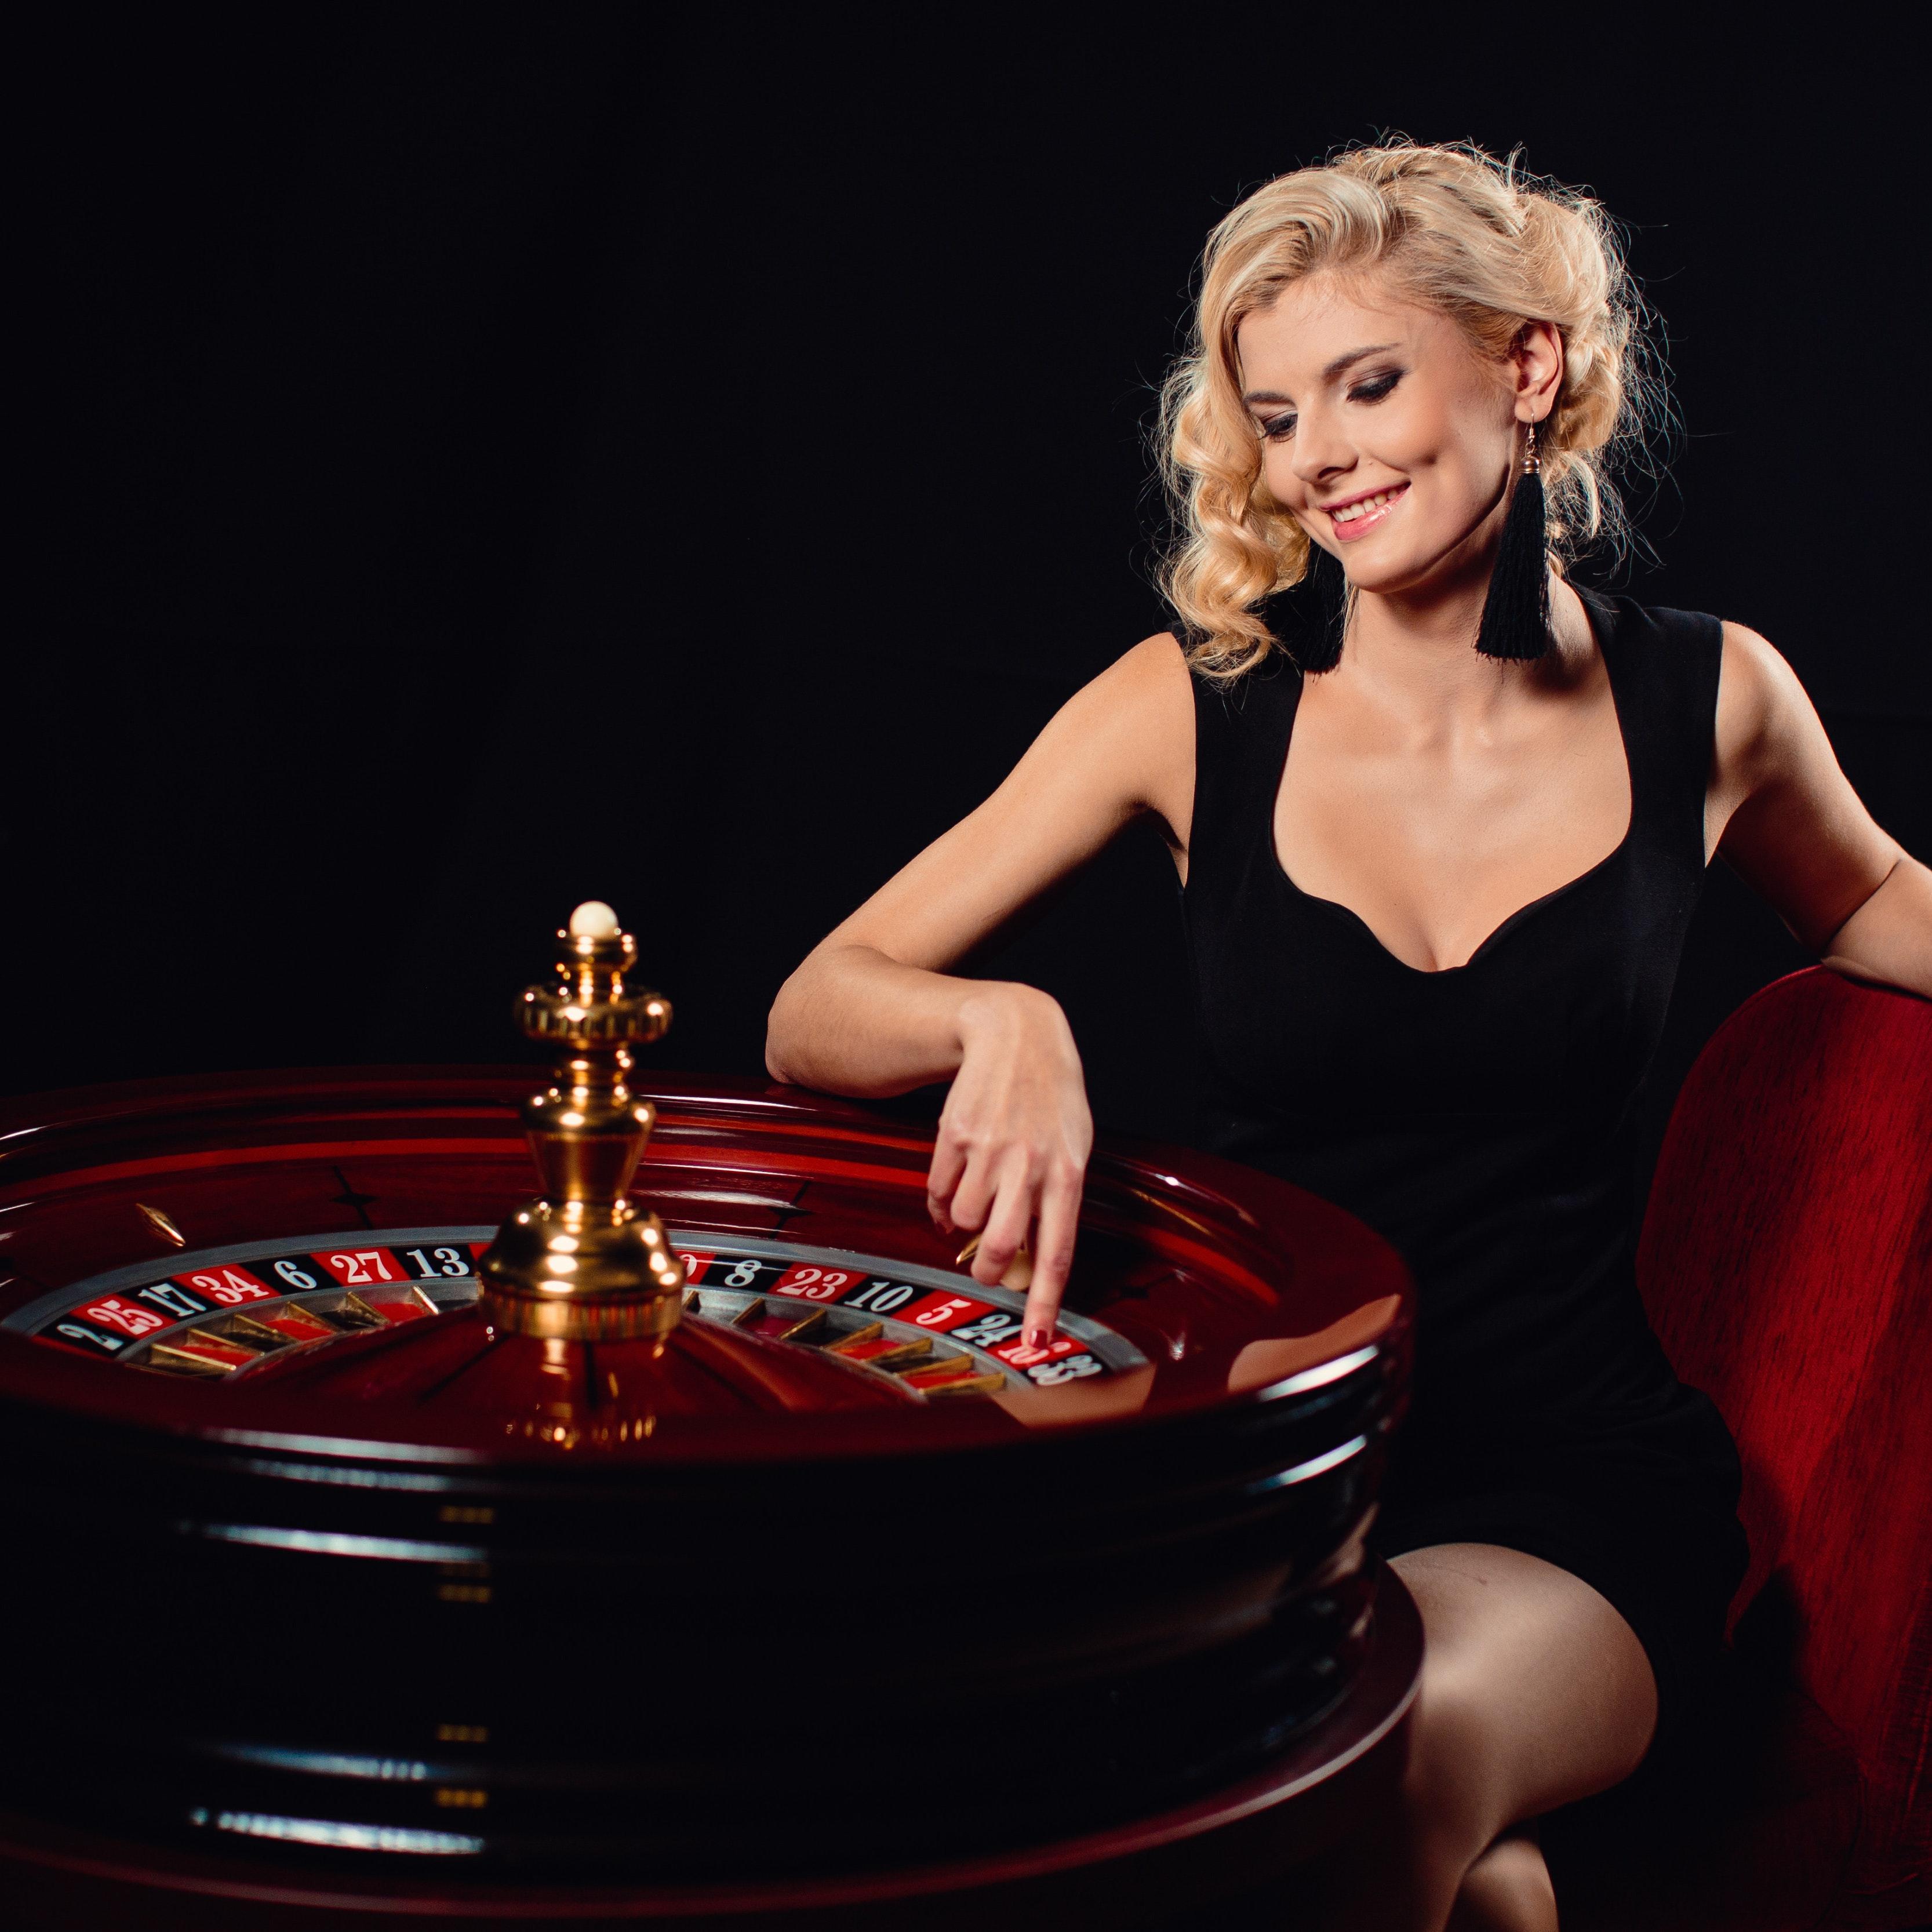 Bitbook minimum bet on roulette las vegas nightmare sports betting